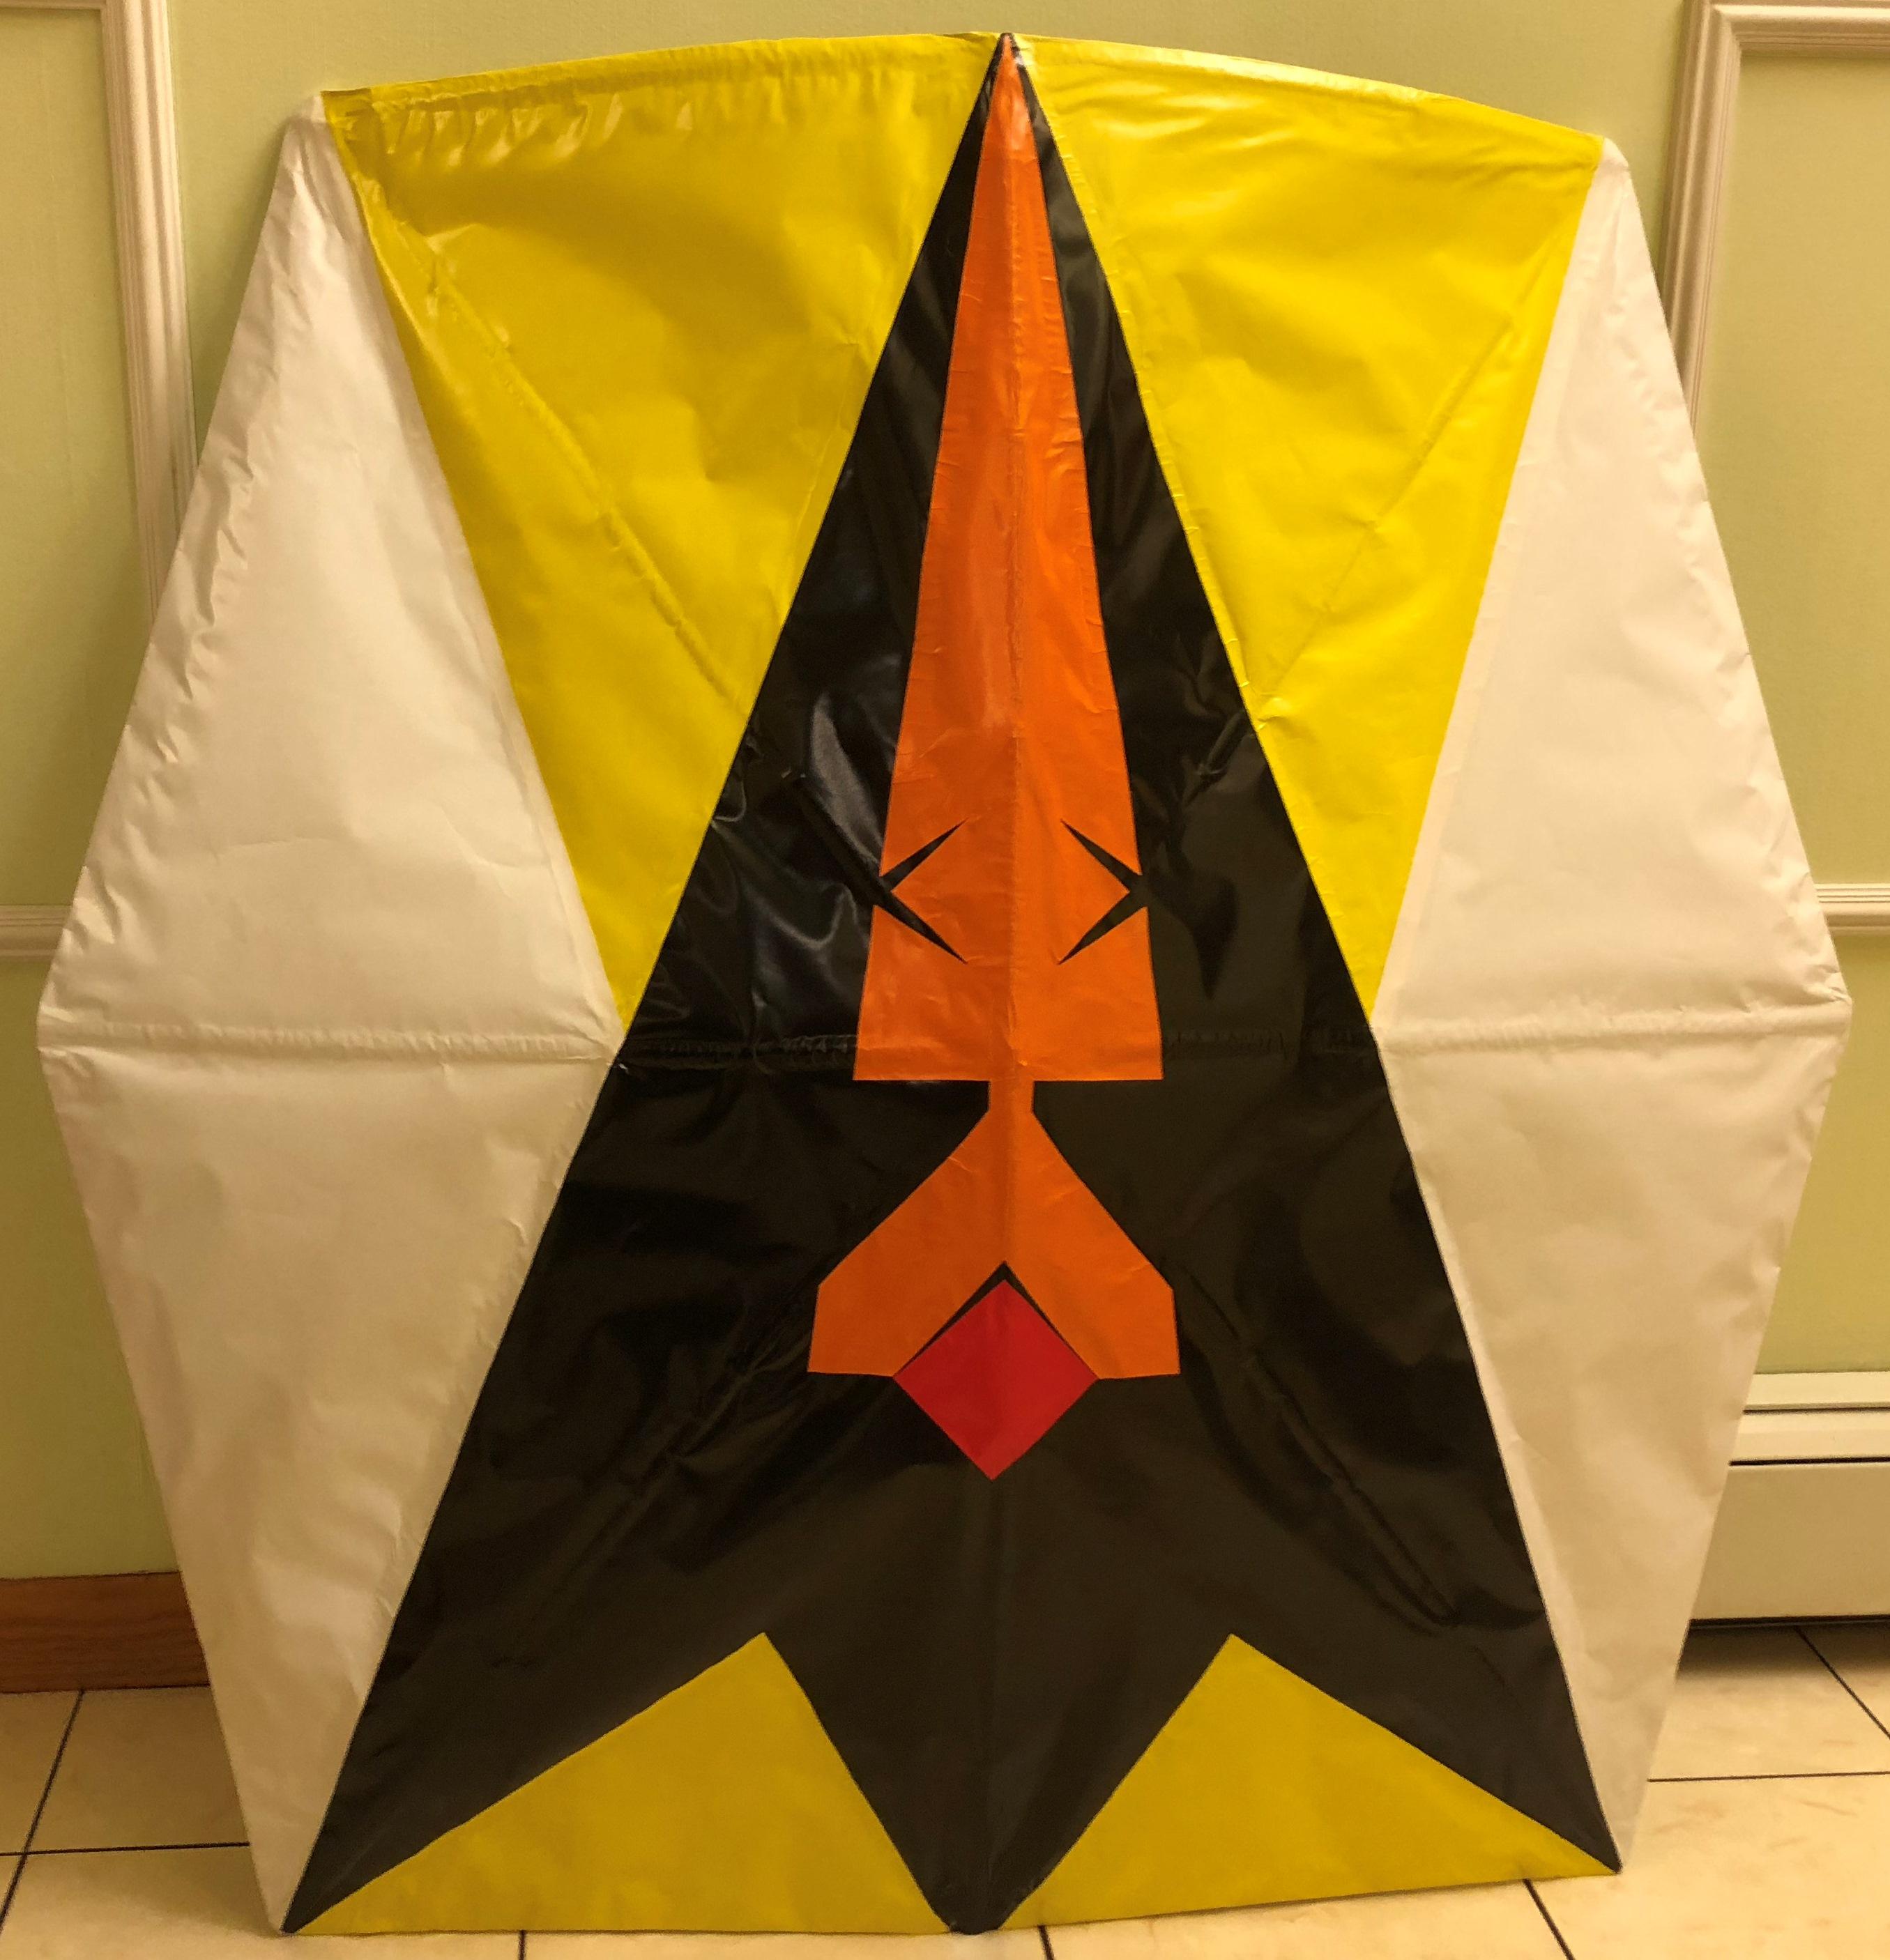 jamaican bamboo kite1 flyringokite.com